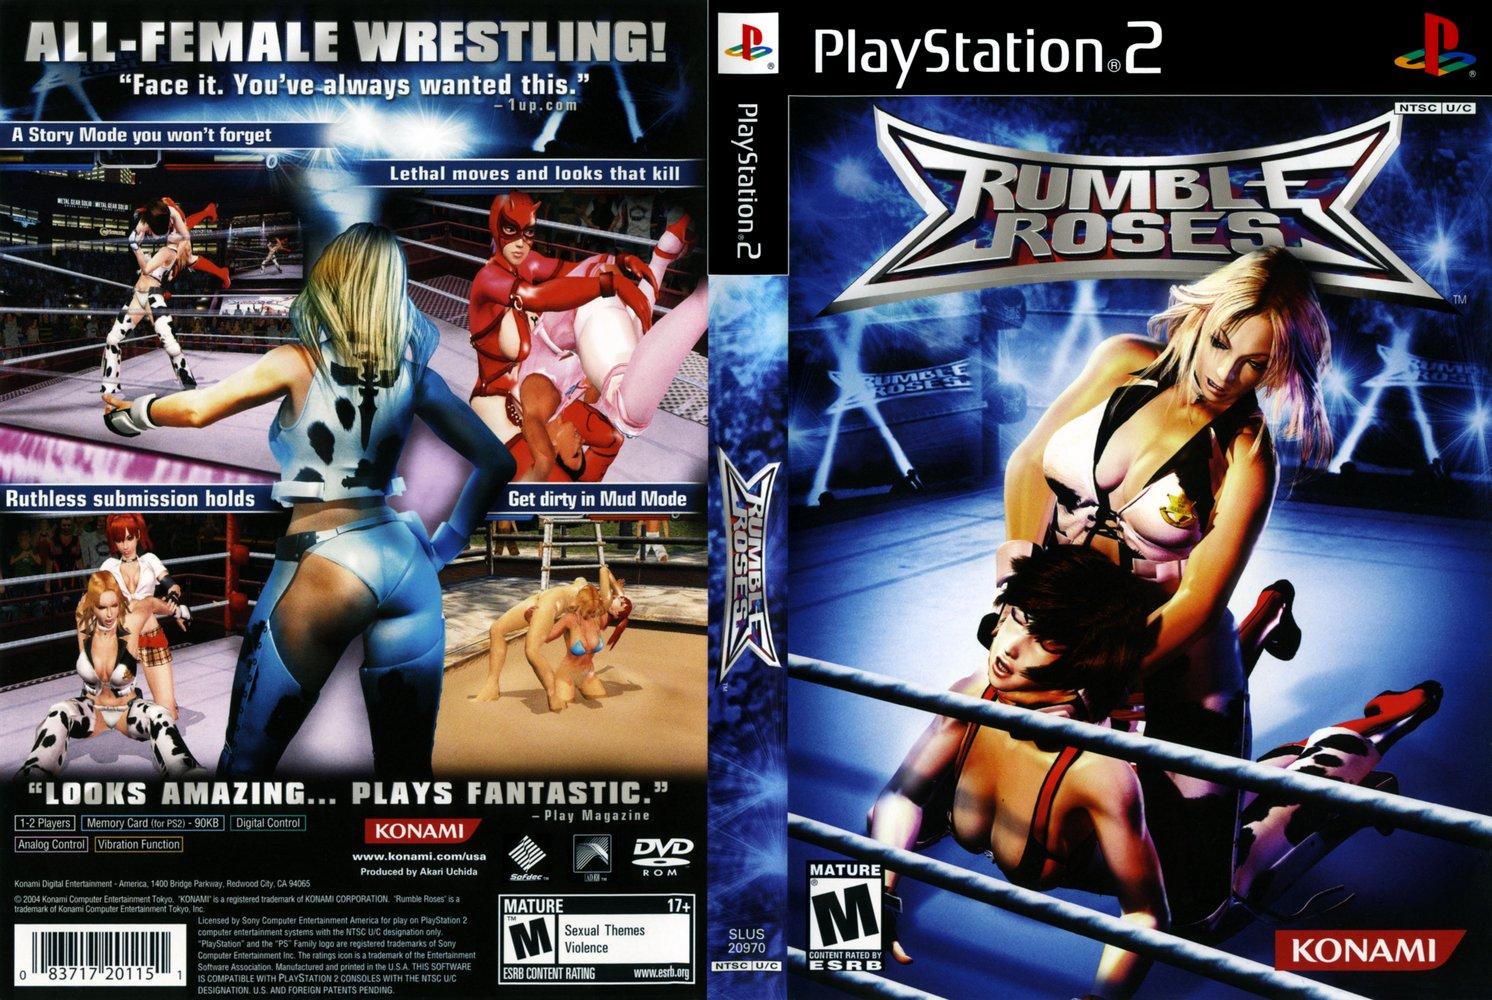 Playstation 2 - Sugerencias, Preguntas,Dudas,Etc - Página 2 Rumble_roses_dvd_ntsc-5btheps2games-com5d